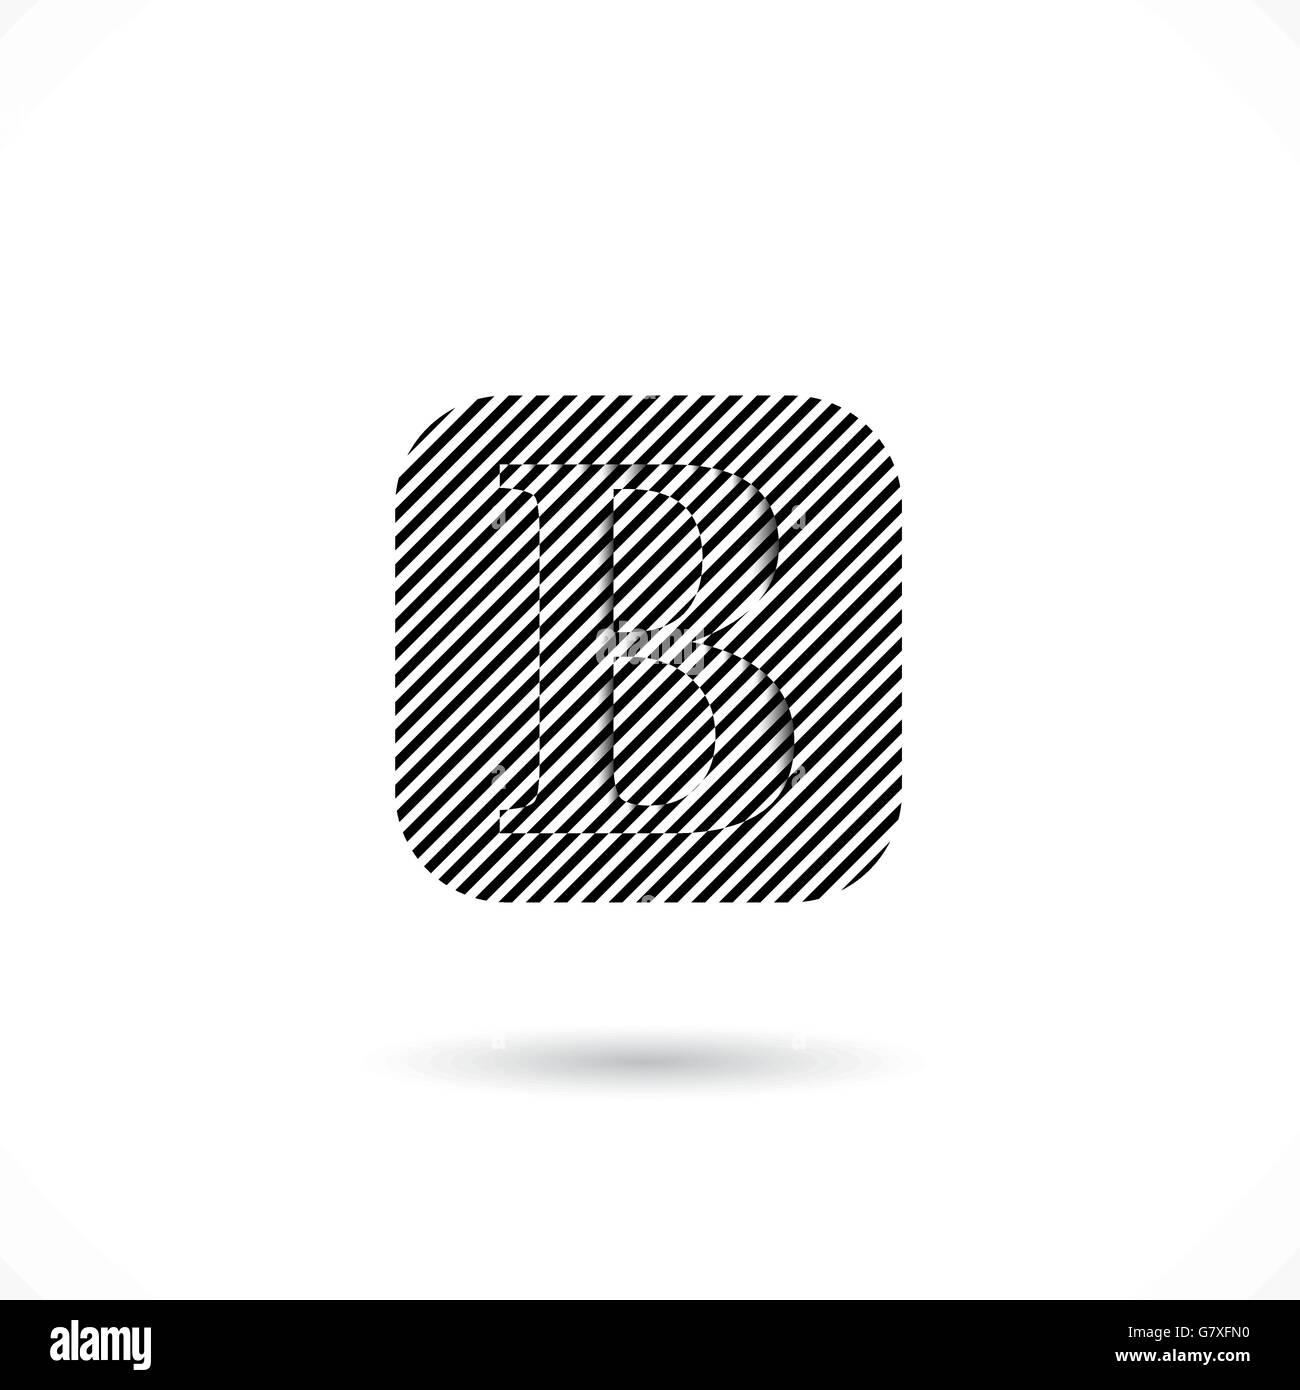 B Creative Lettre Resume Icone Vecteur Conception De Logo Template B